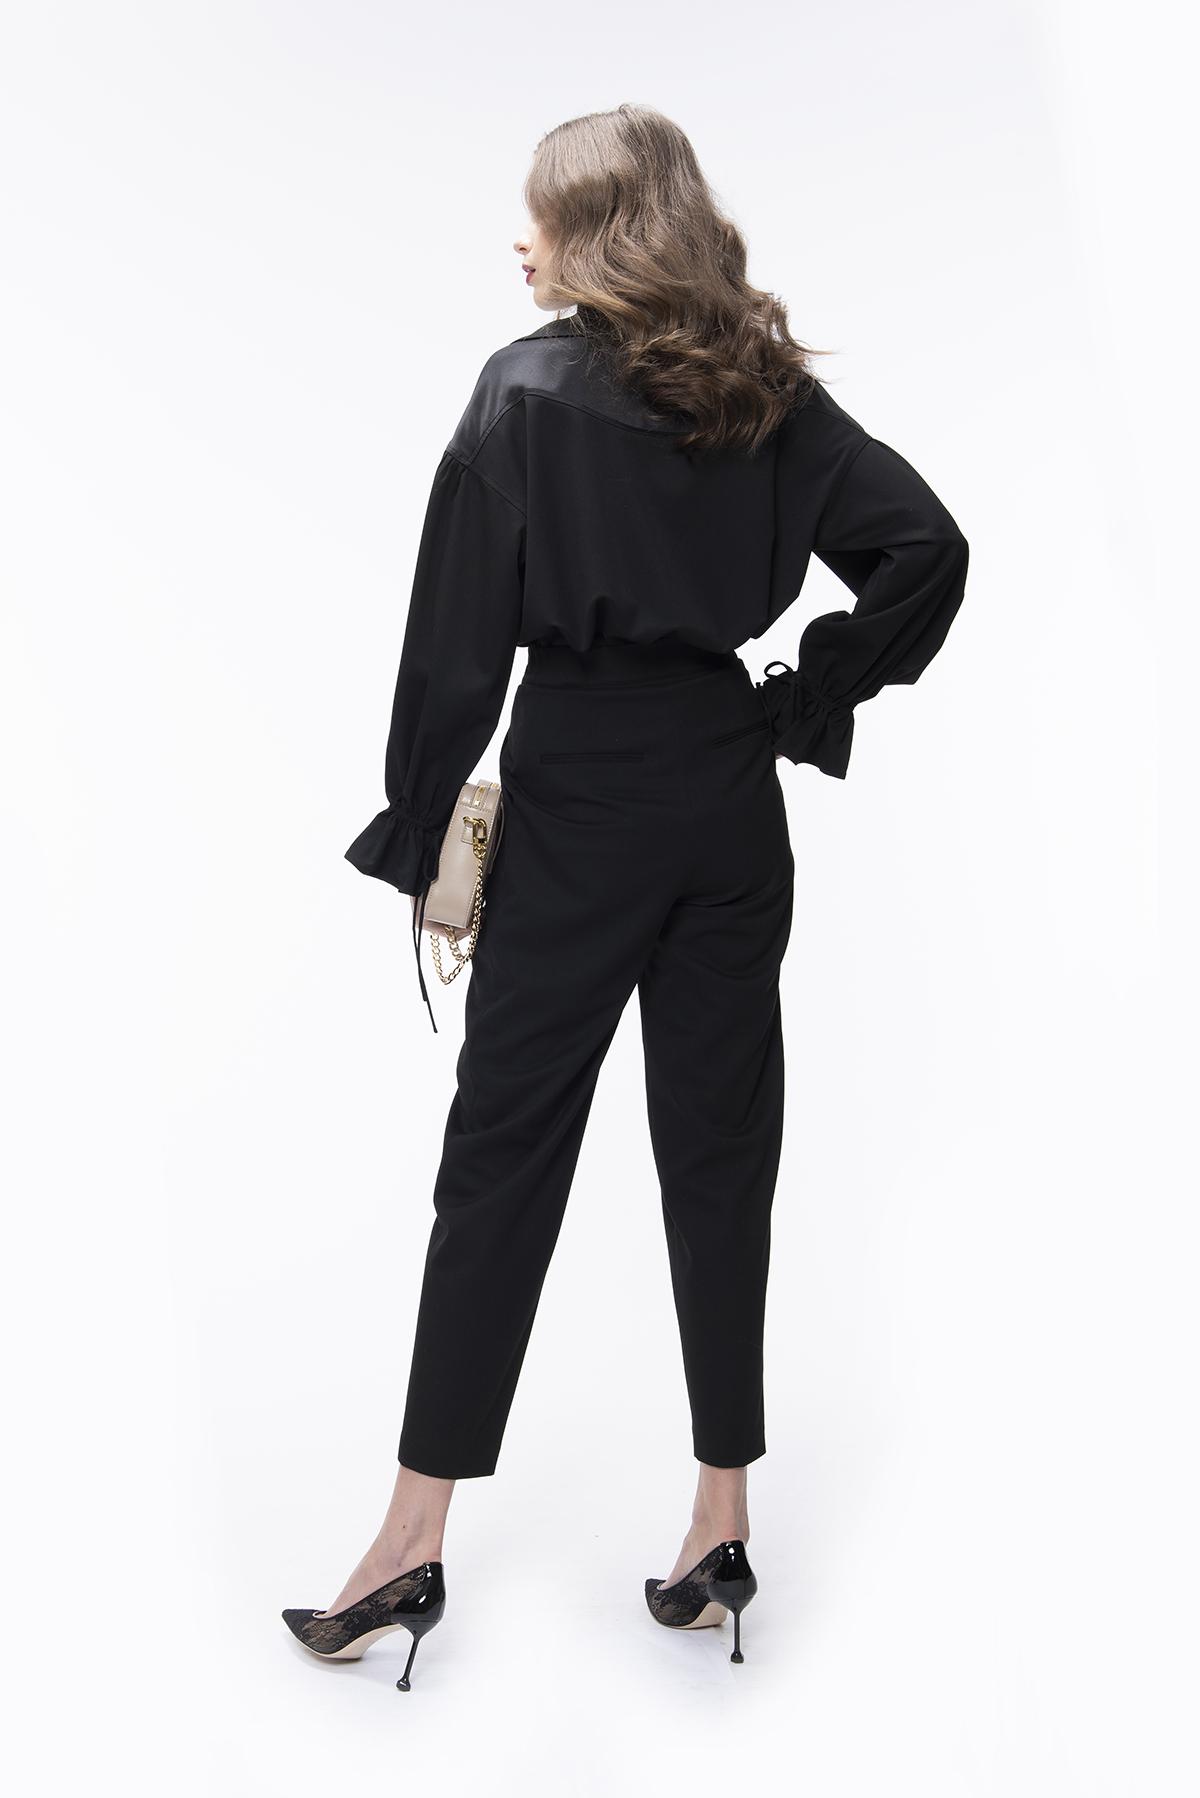 Designer Shirts For Women